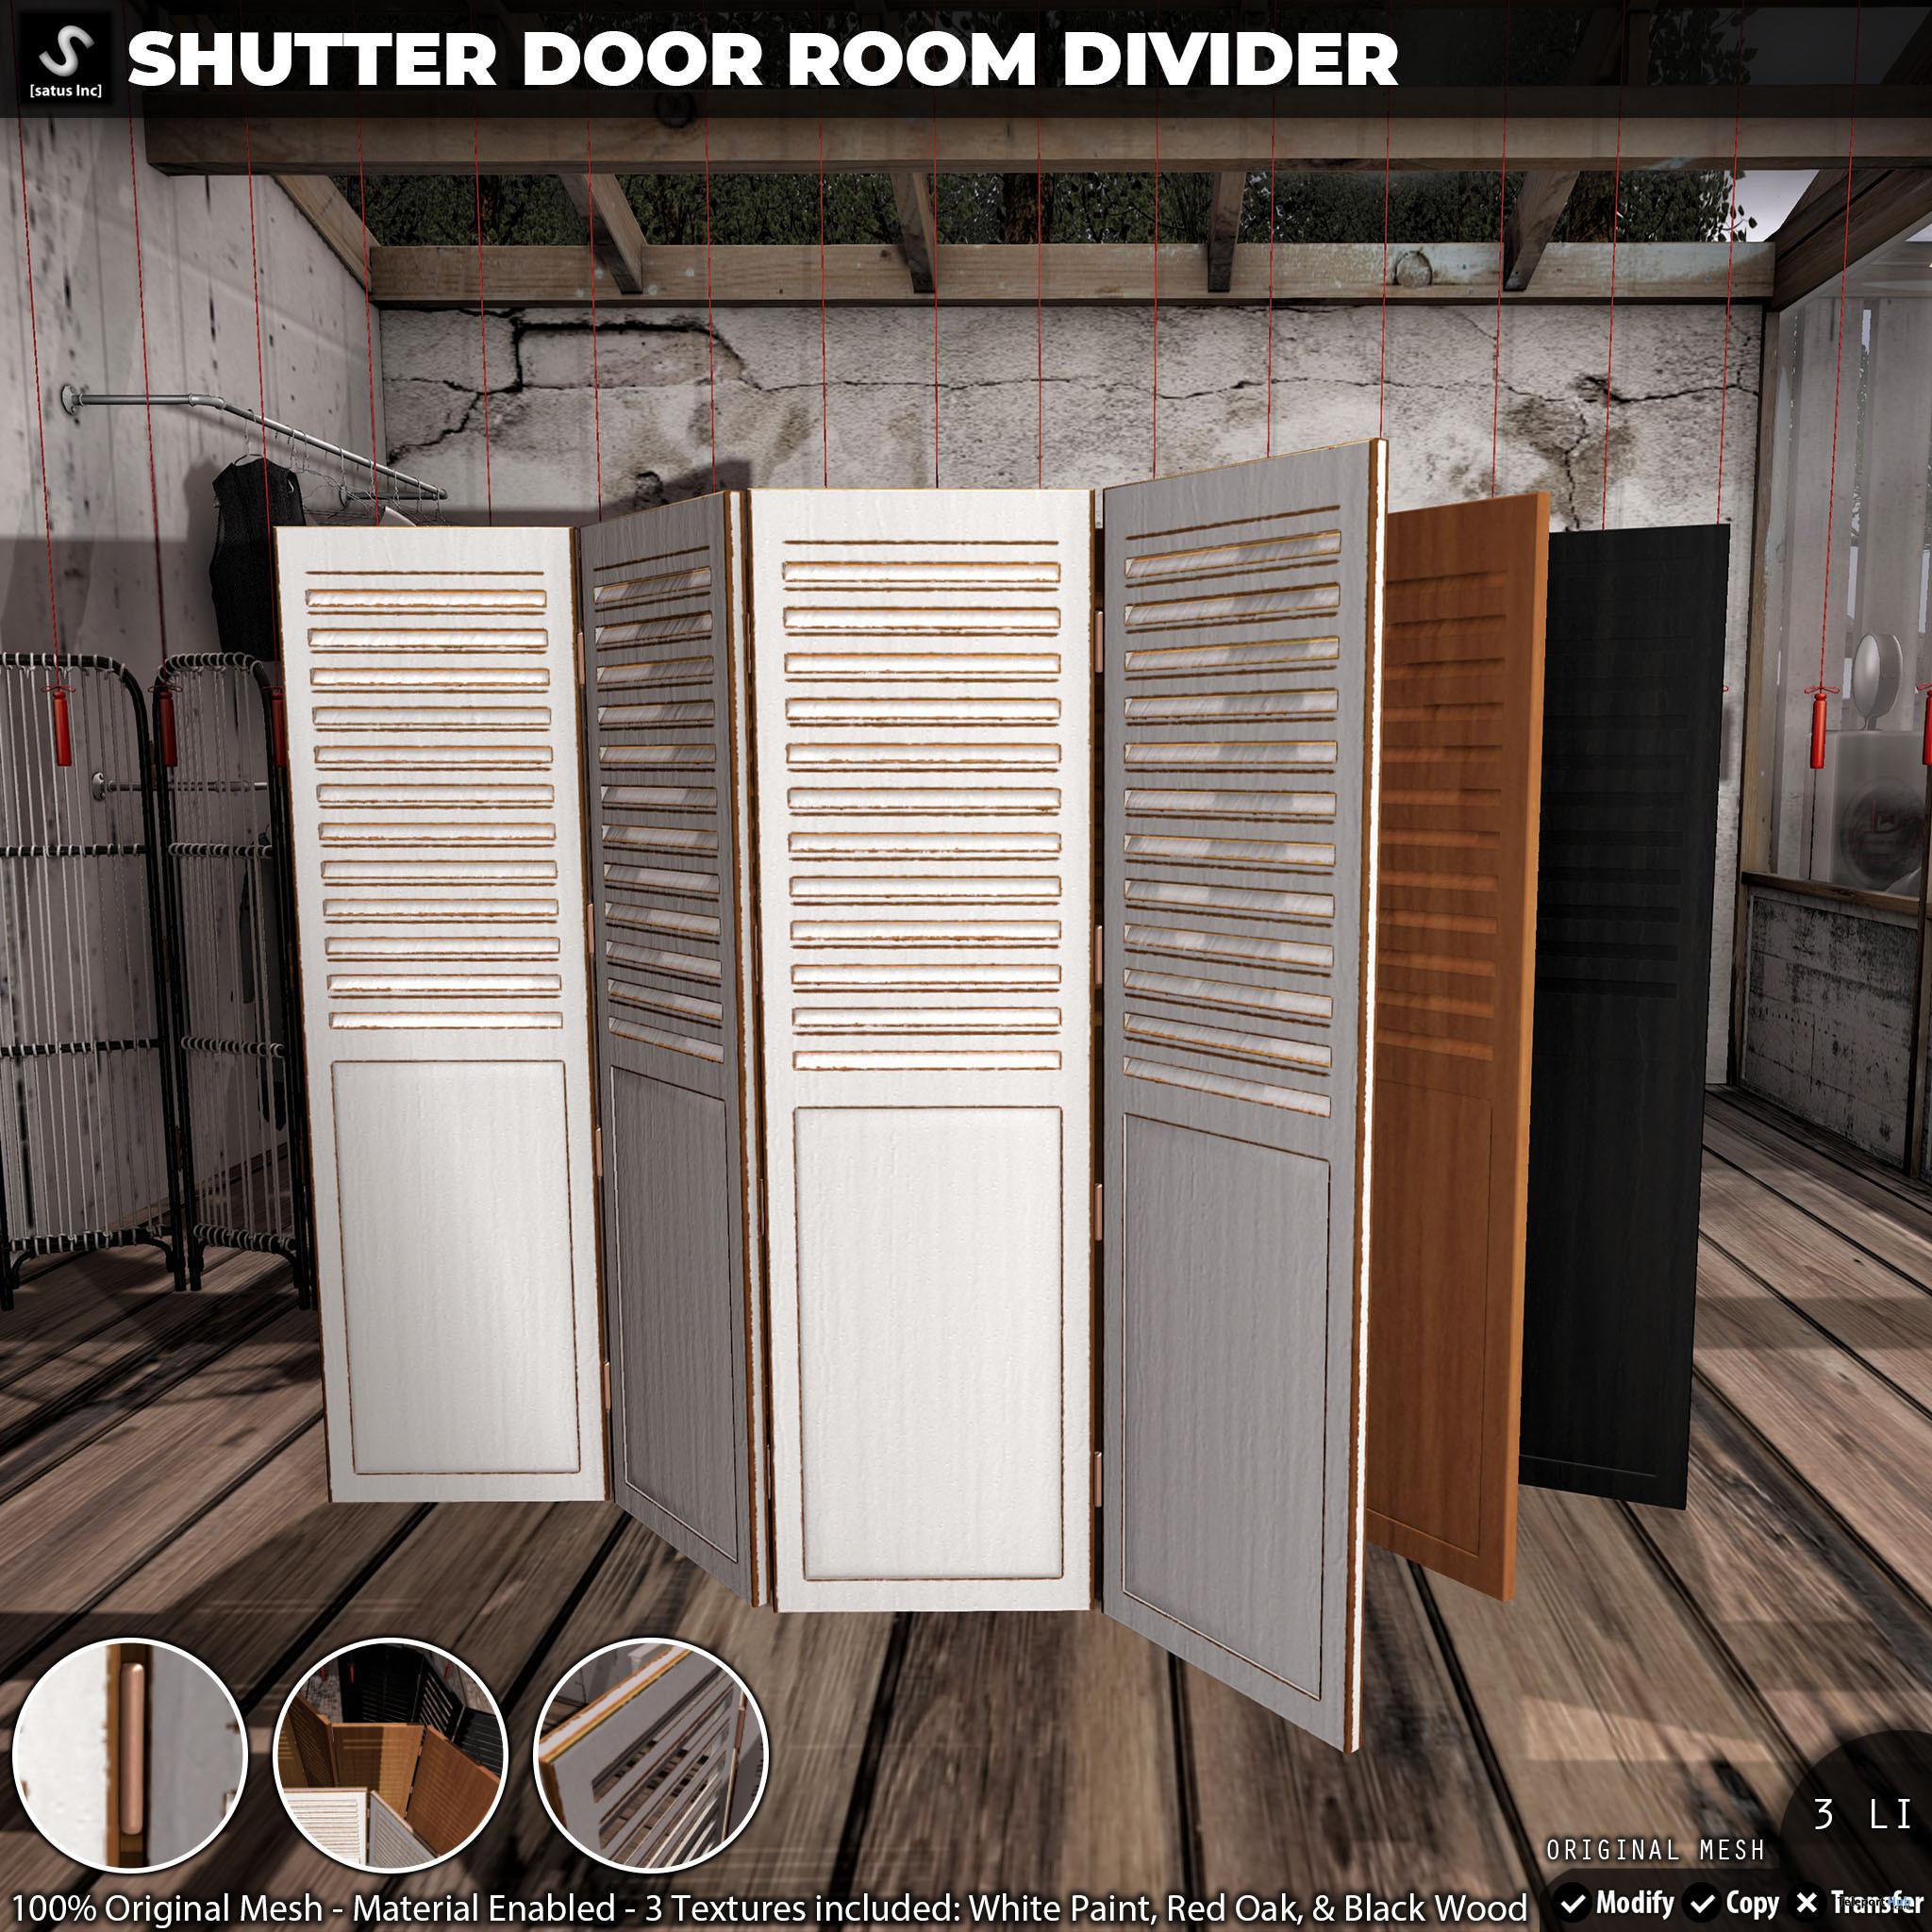 New Release: Shutter Door Room Divider by [satus Inc] - Teleport Hub - teleporthub.com